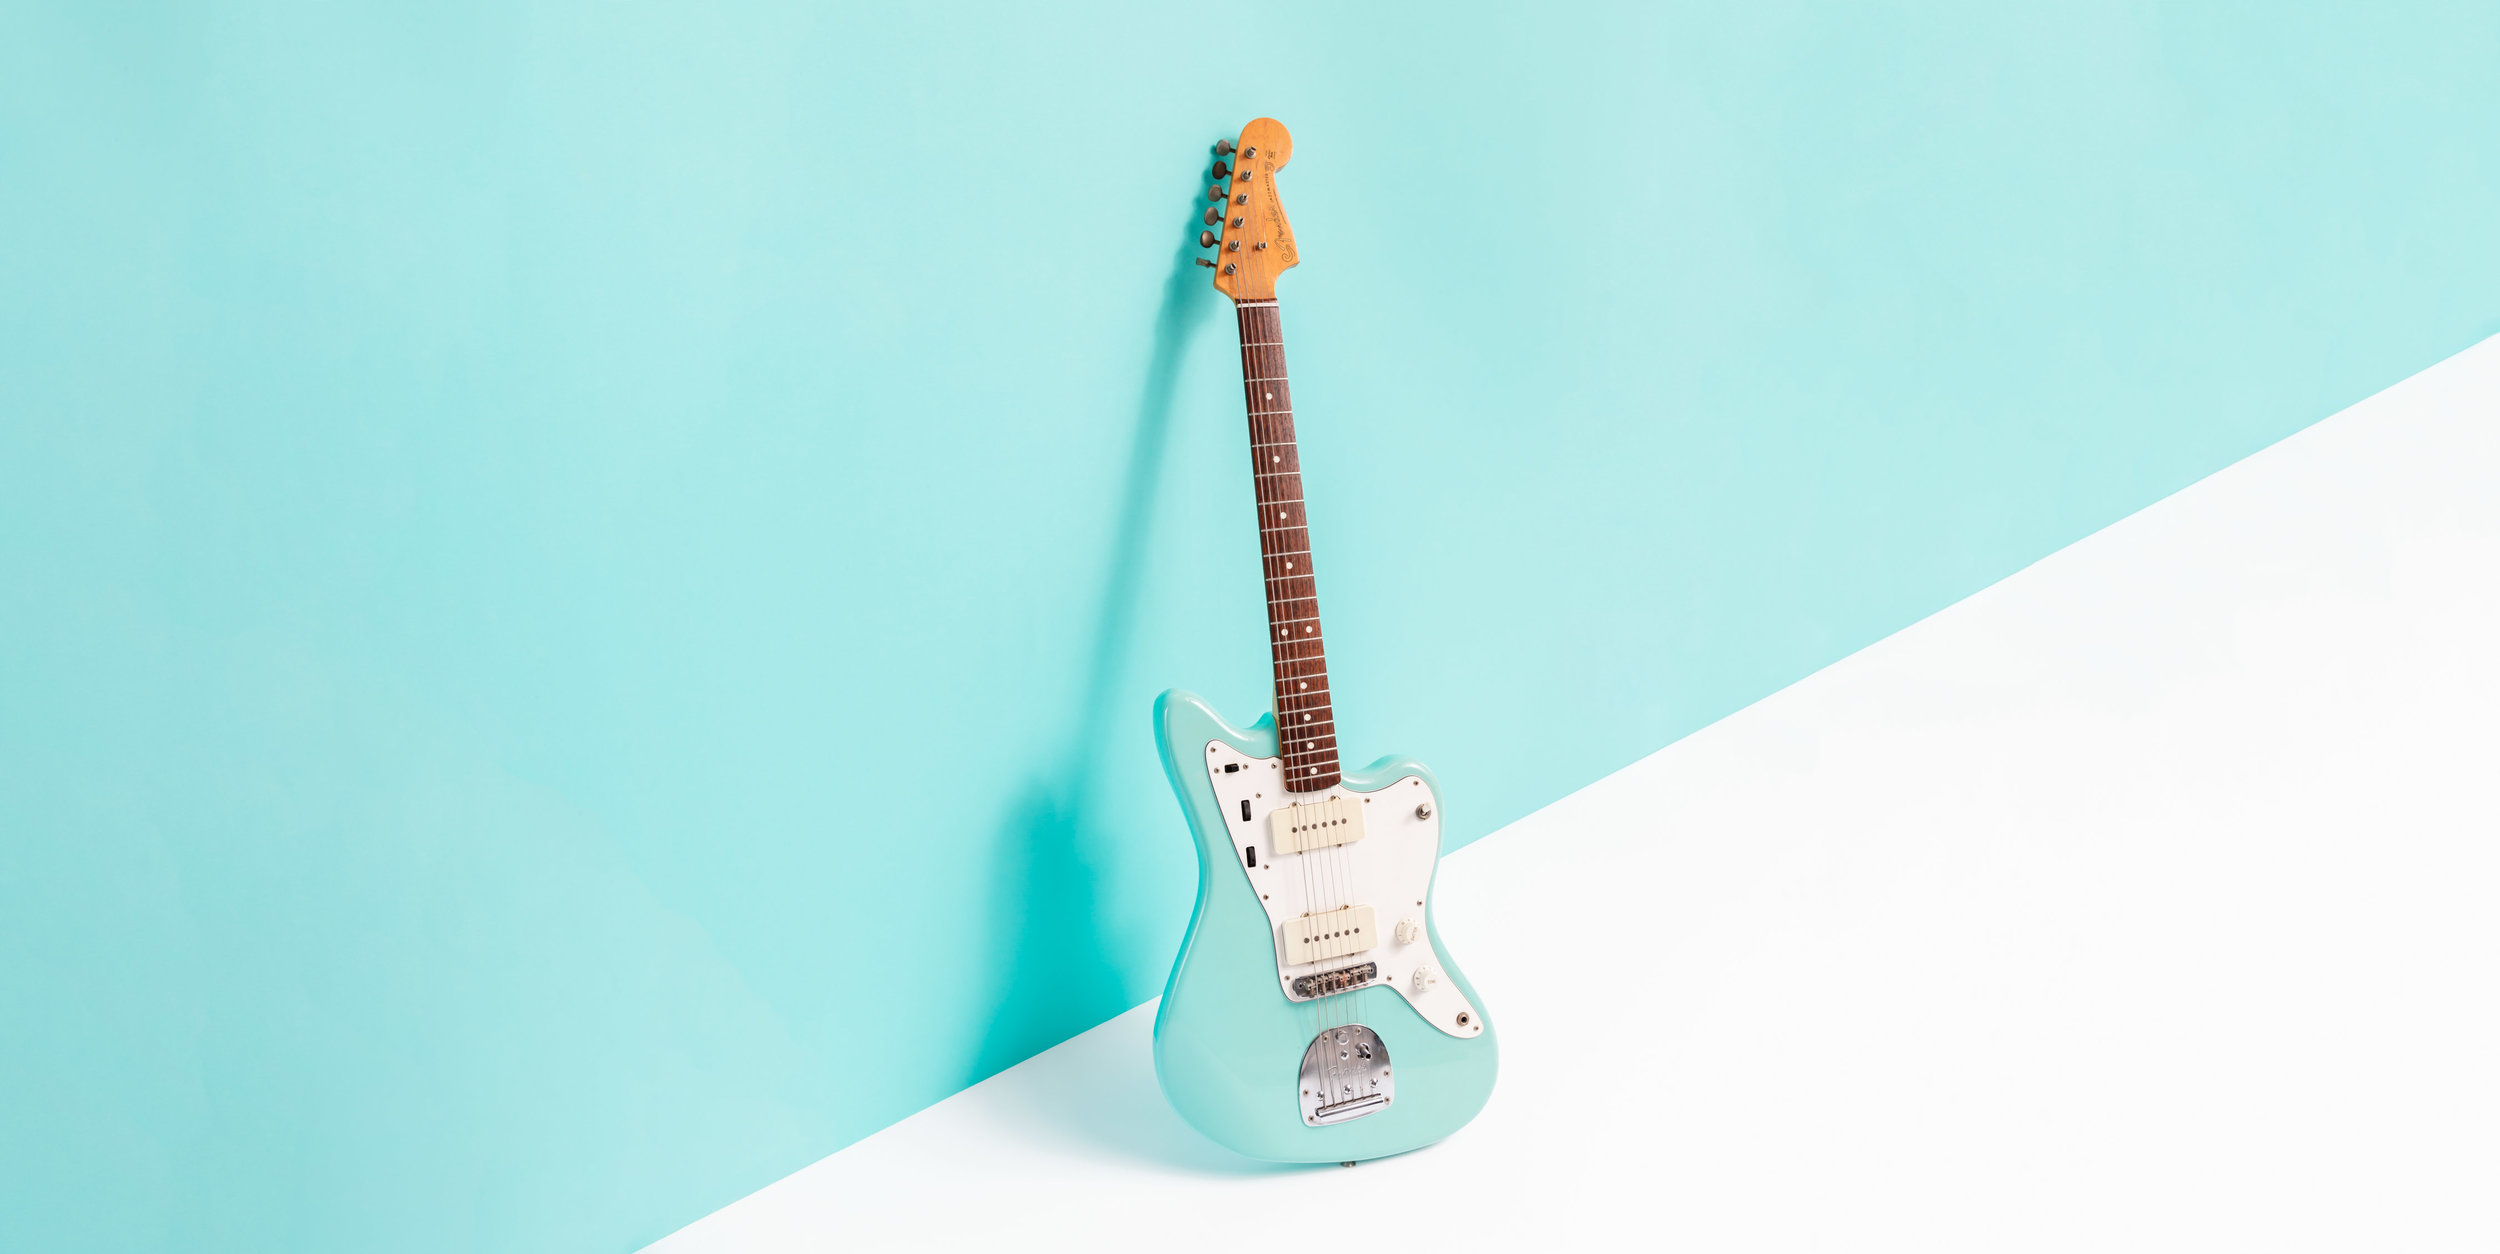 092916_MO_Ebay_Electric_Guitar_0035-V04.jpg